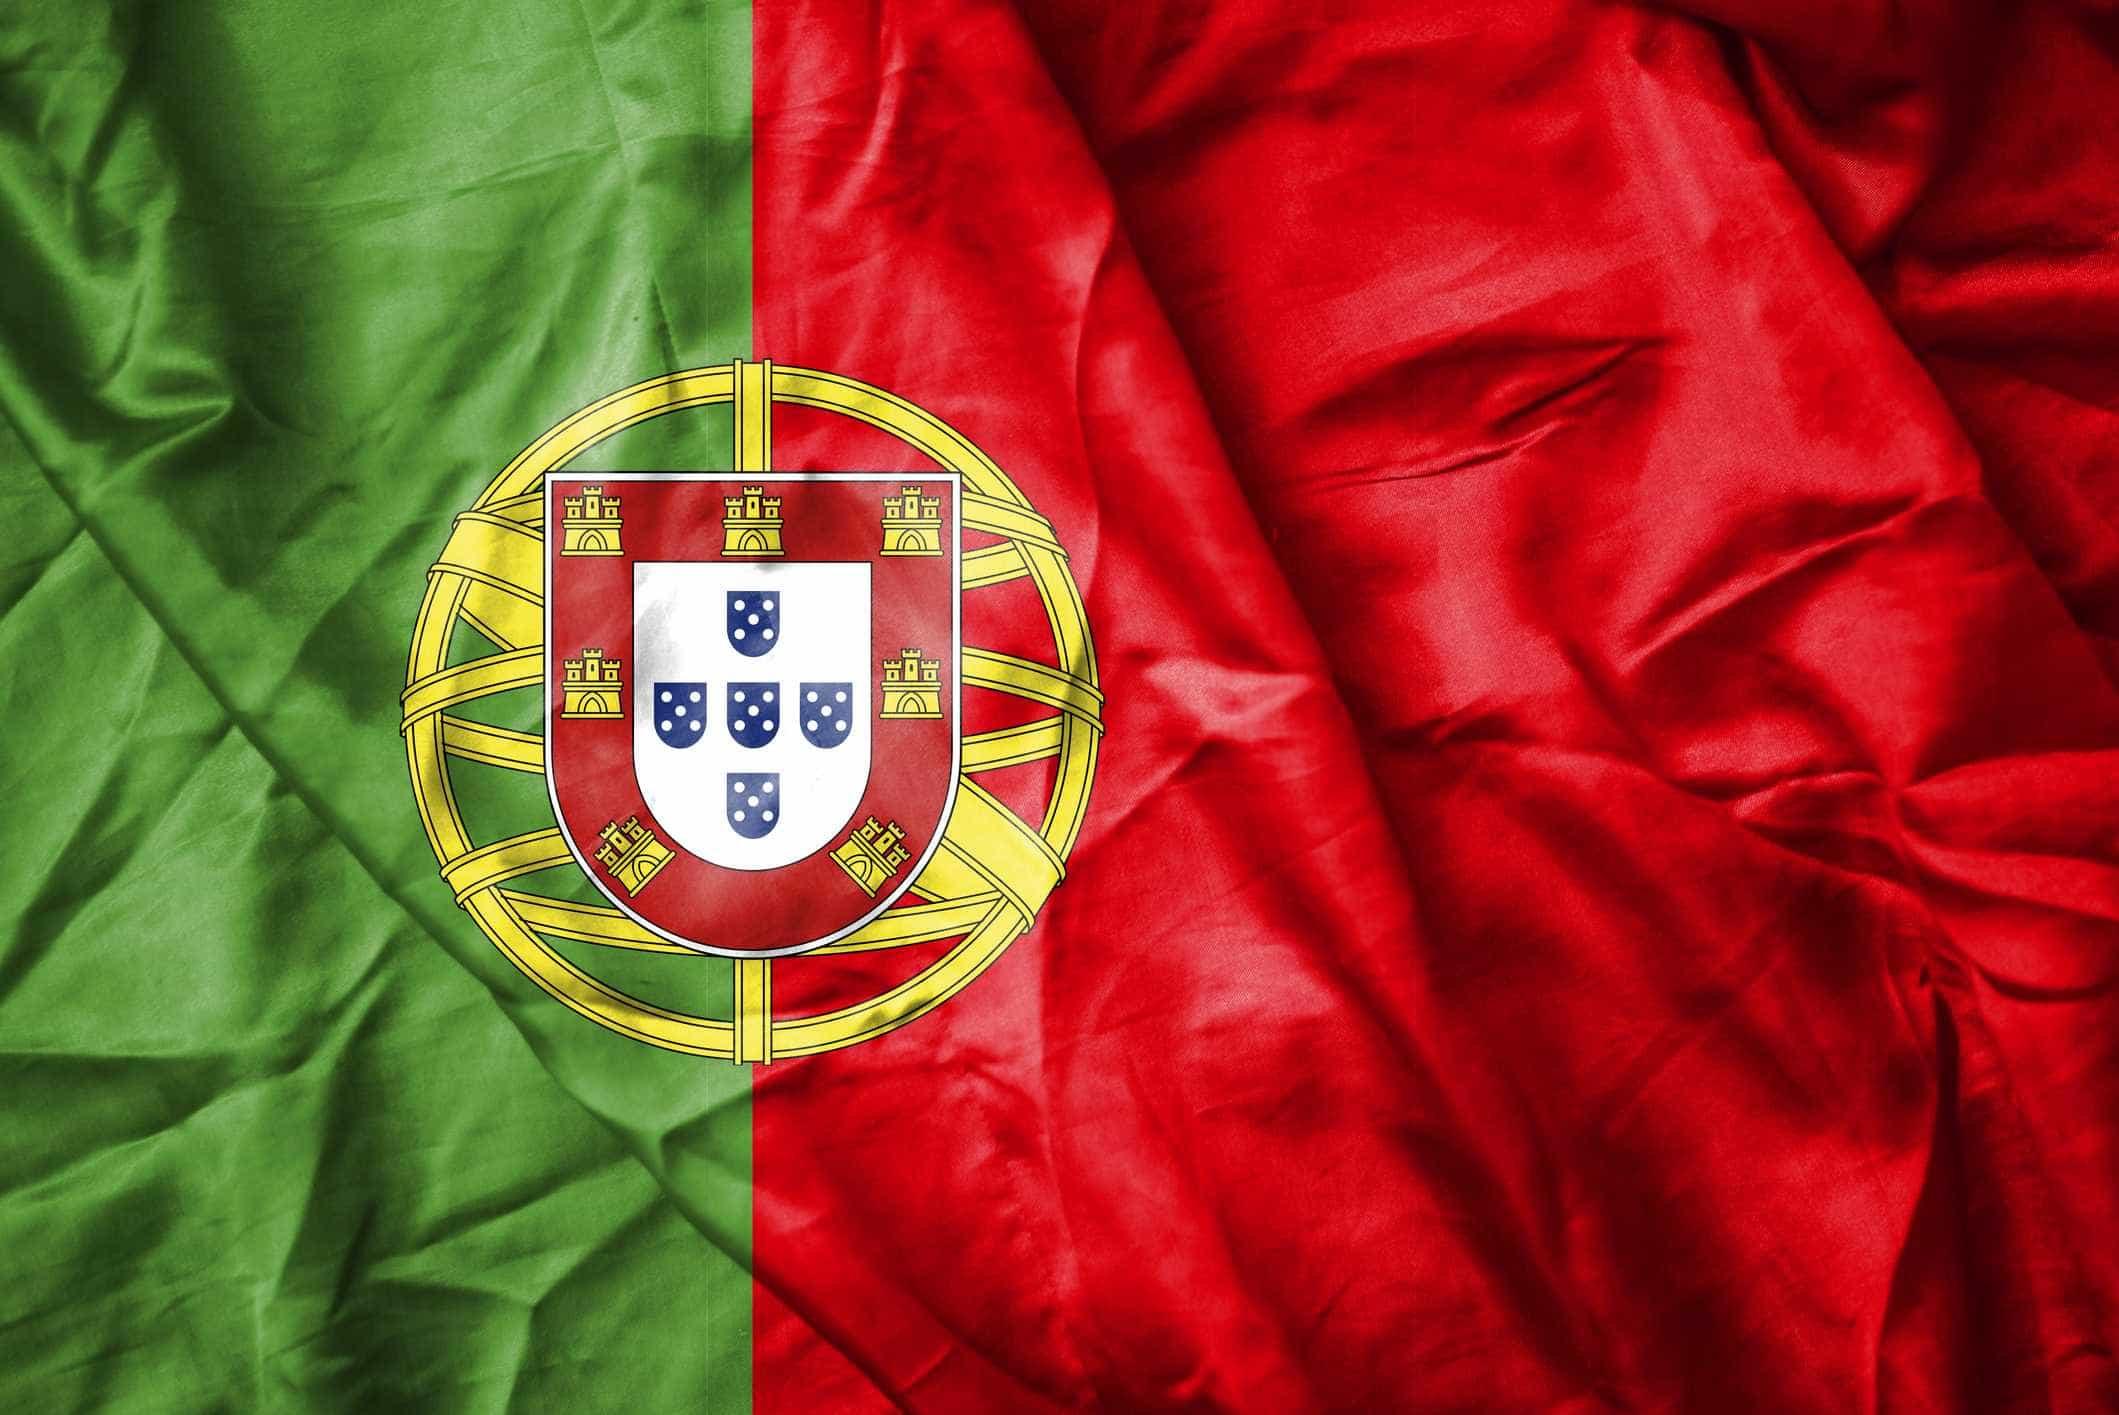 Bruxelas ainda aponta desequilíbrios na economia portuguesa